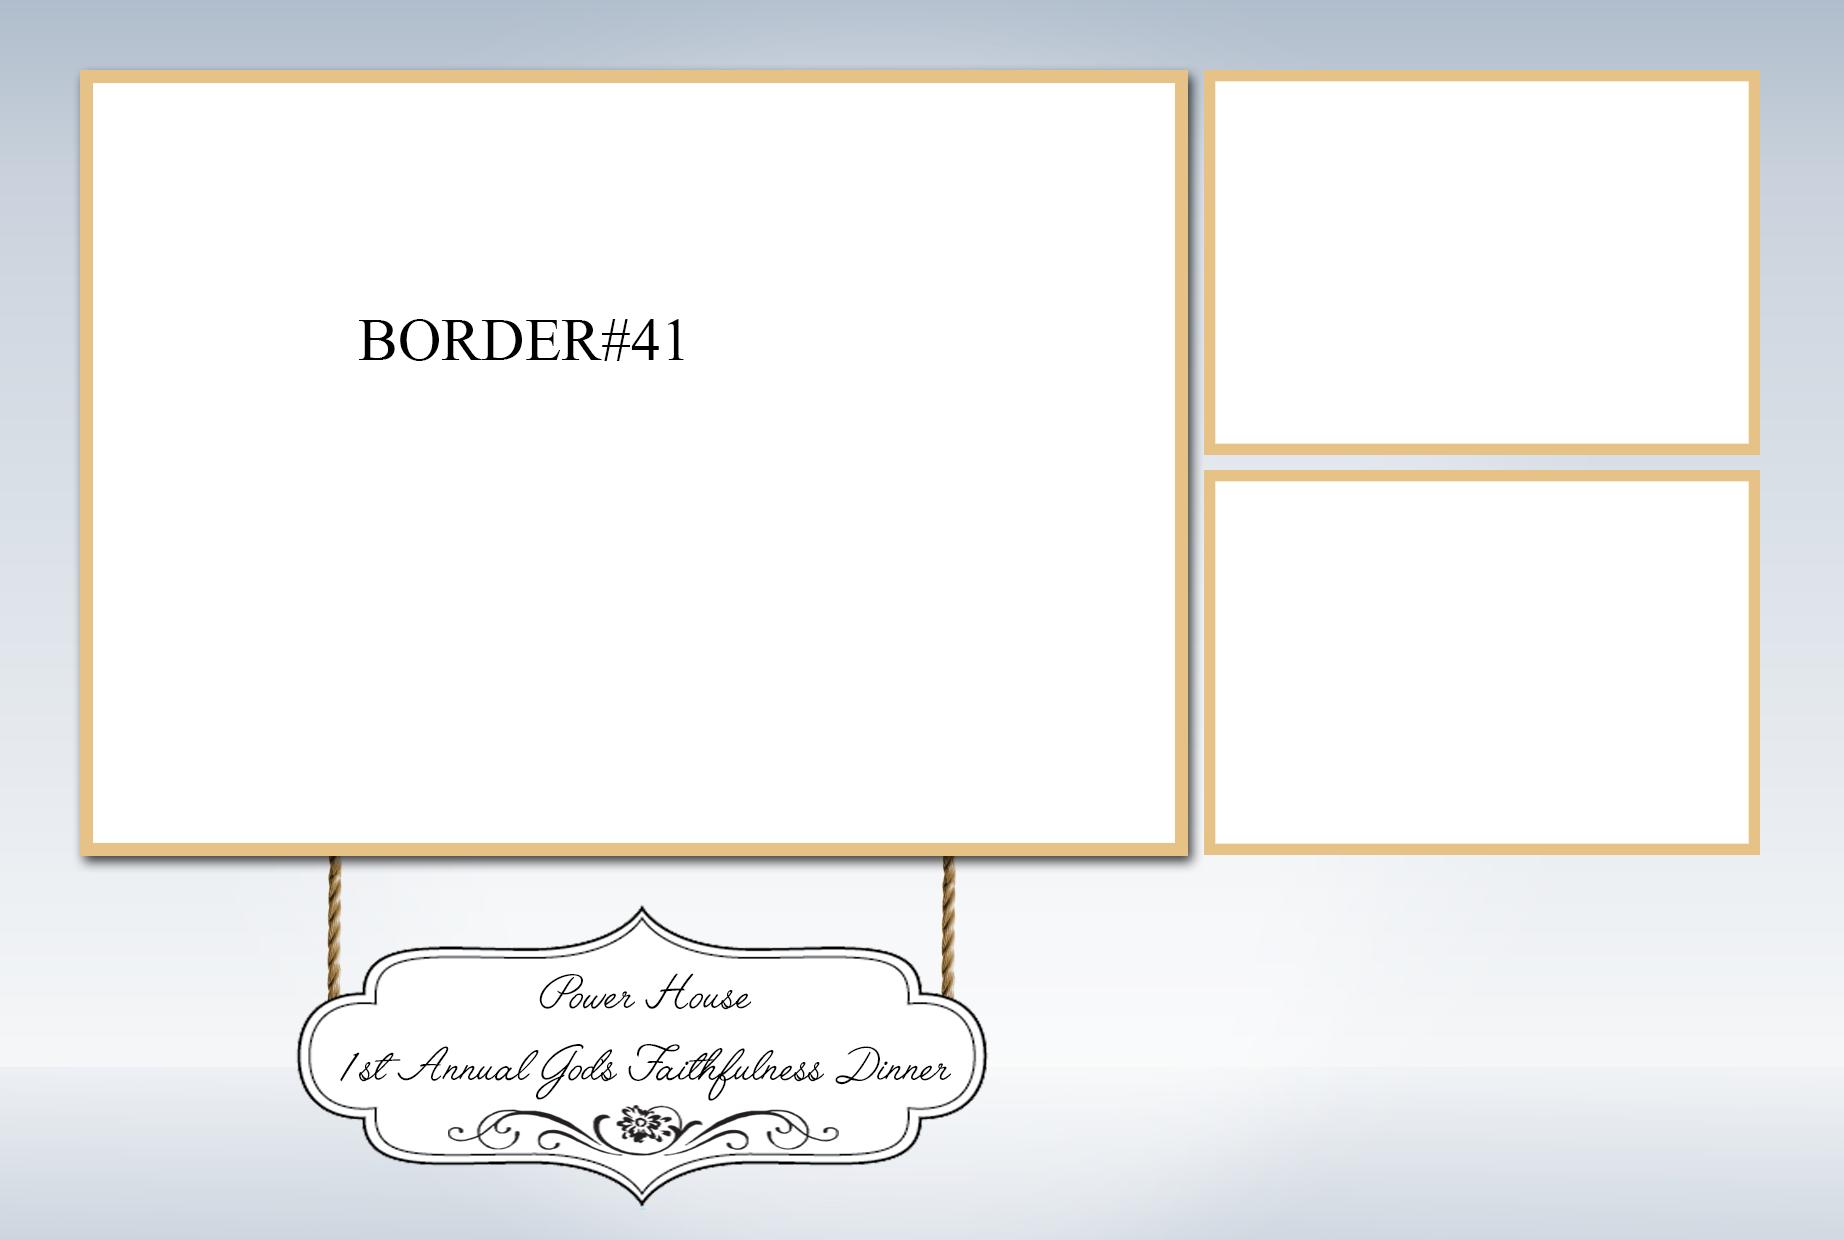 Border#41